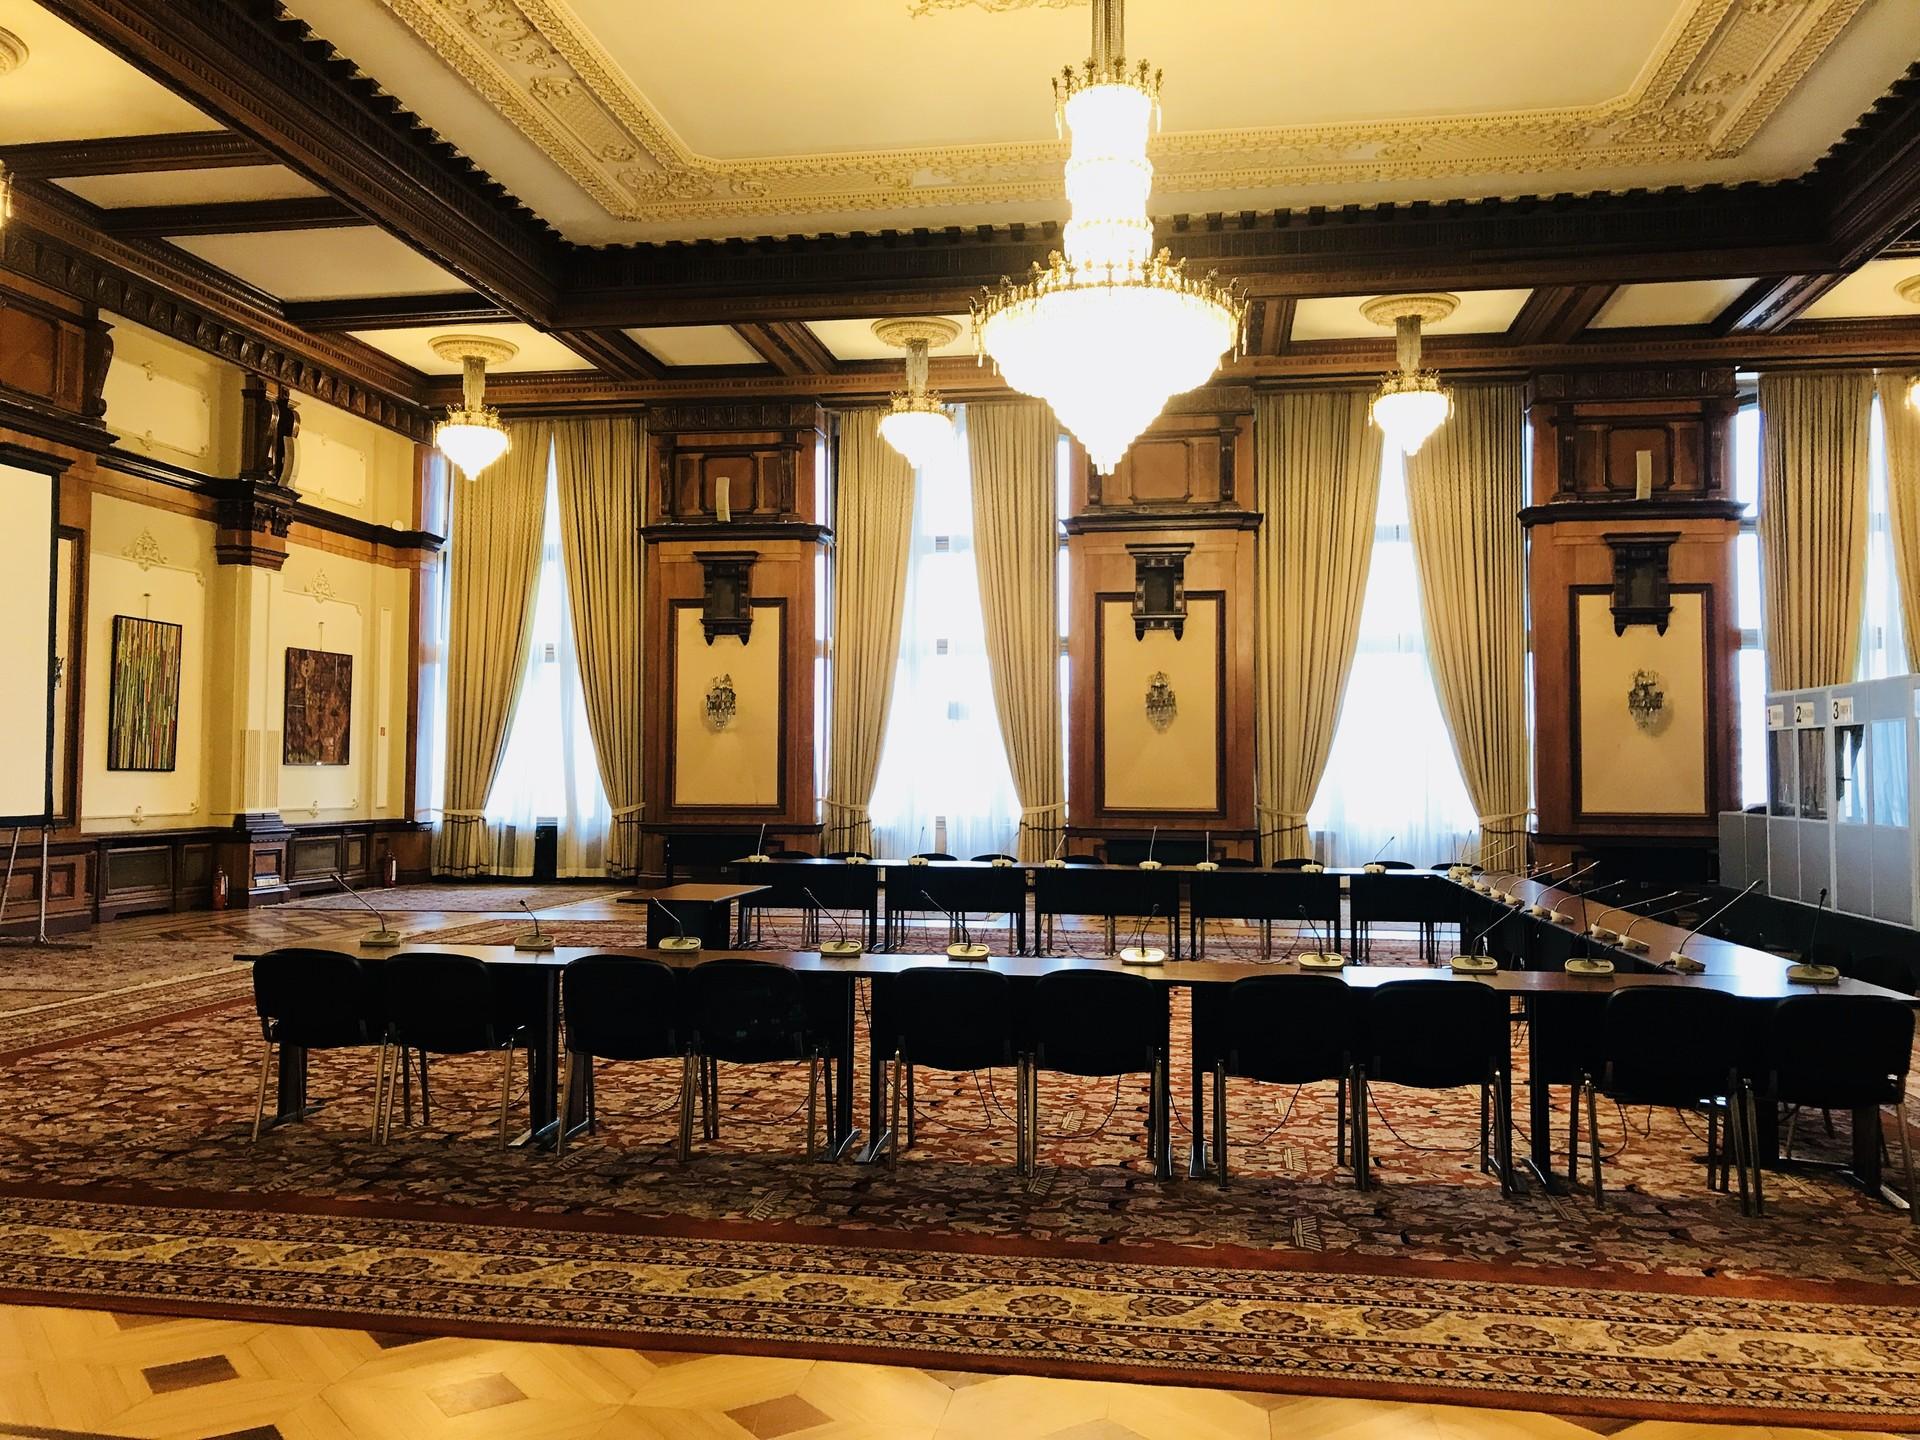 palazzo-parlamento-bucarest-9b9a6a442110